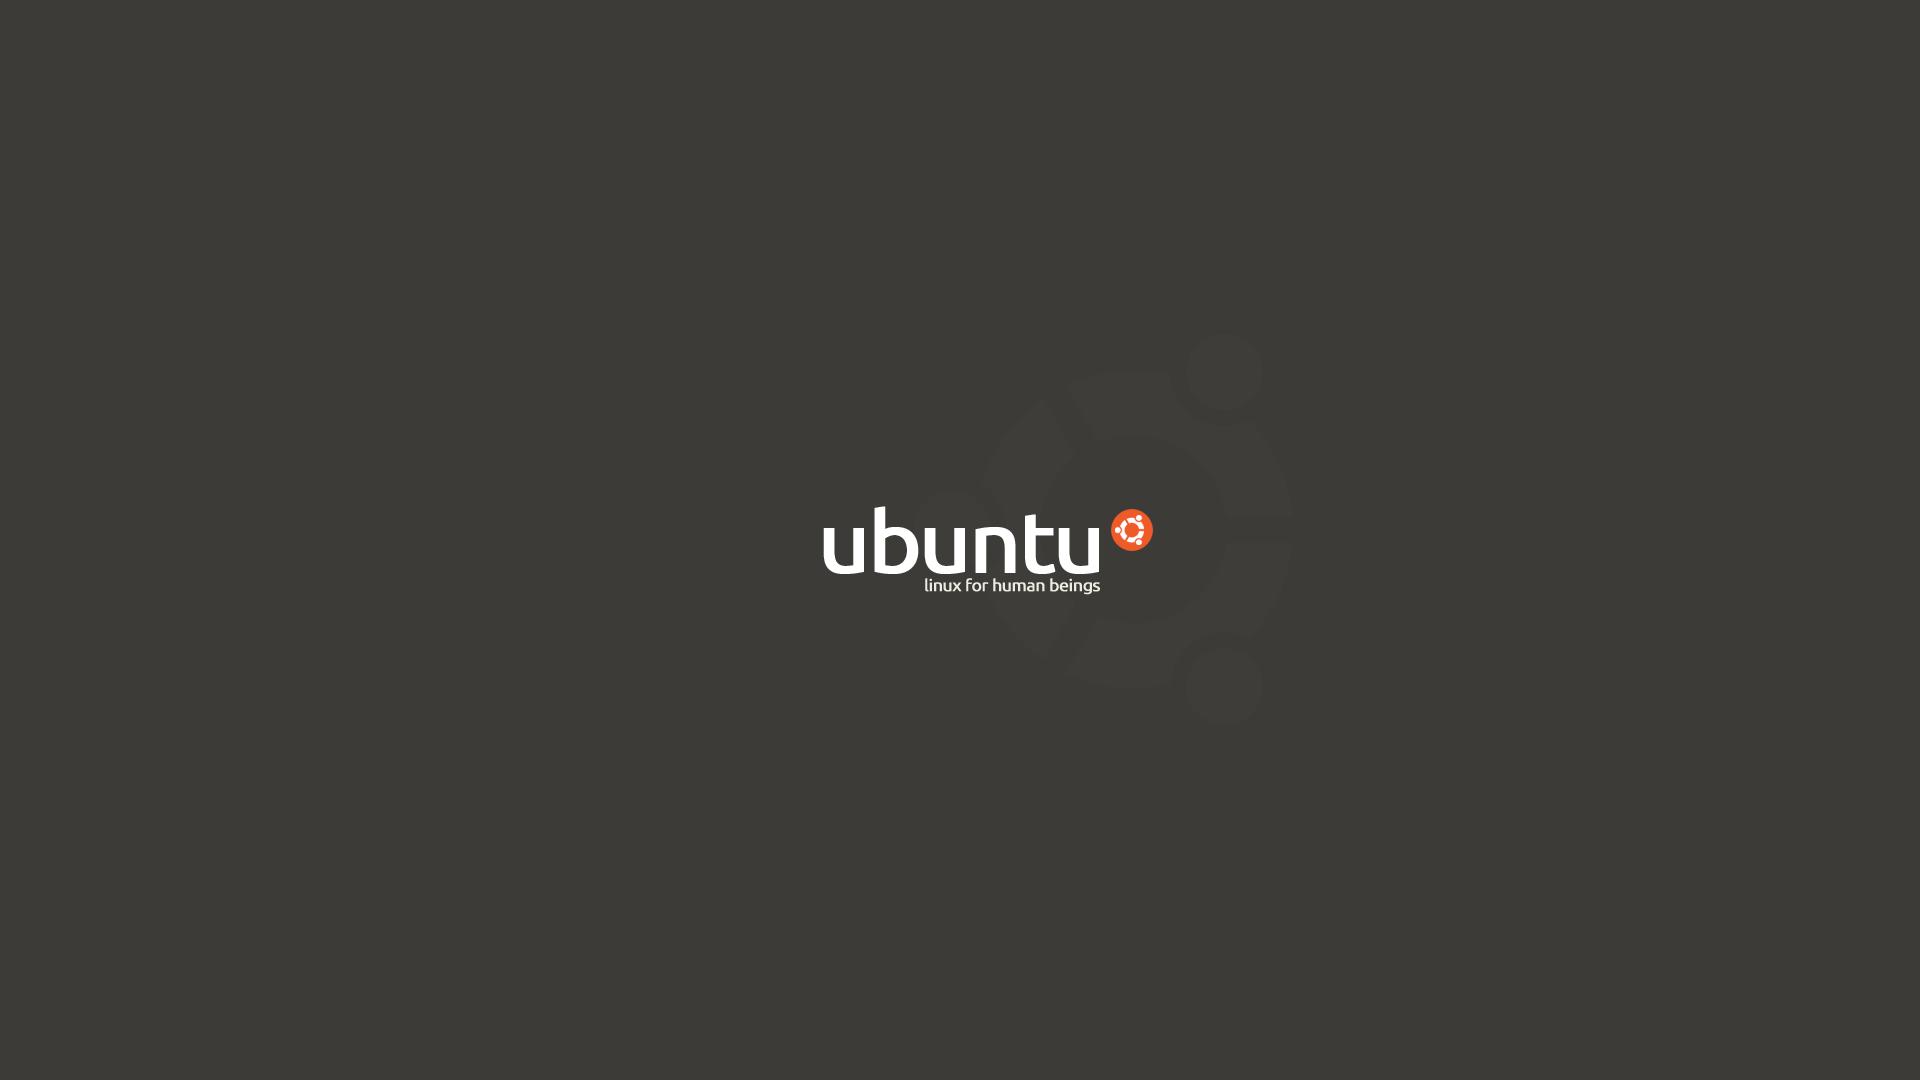 ubuntu mikebeecham wallpaper simple brown linux images 1920x1080